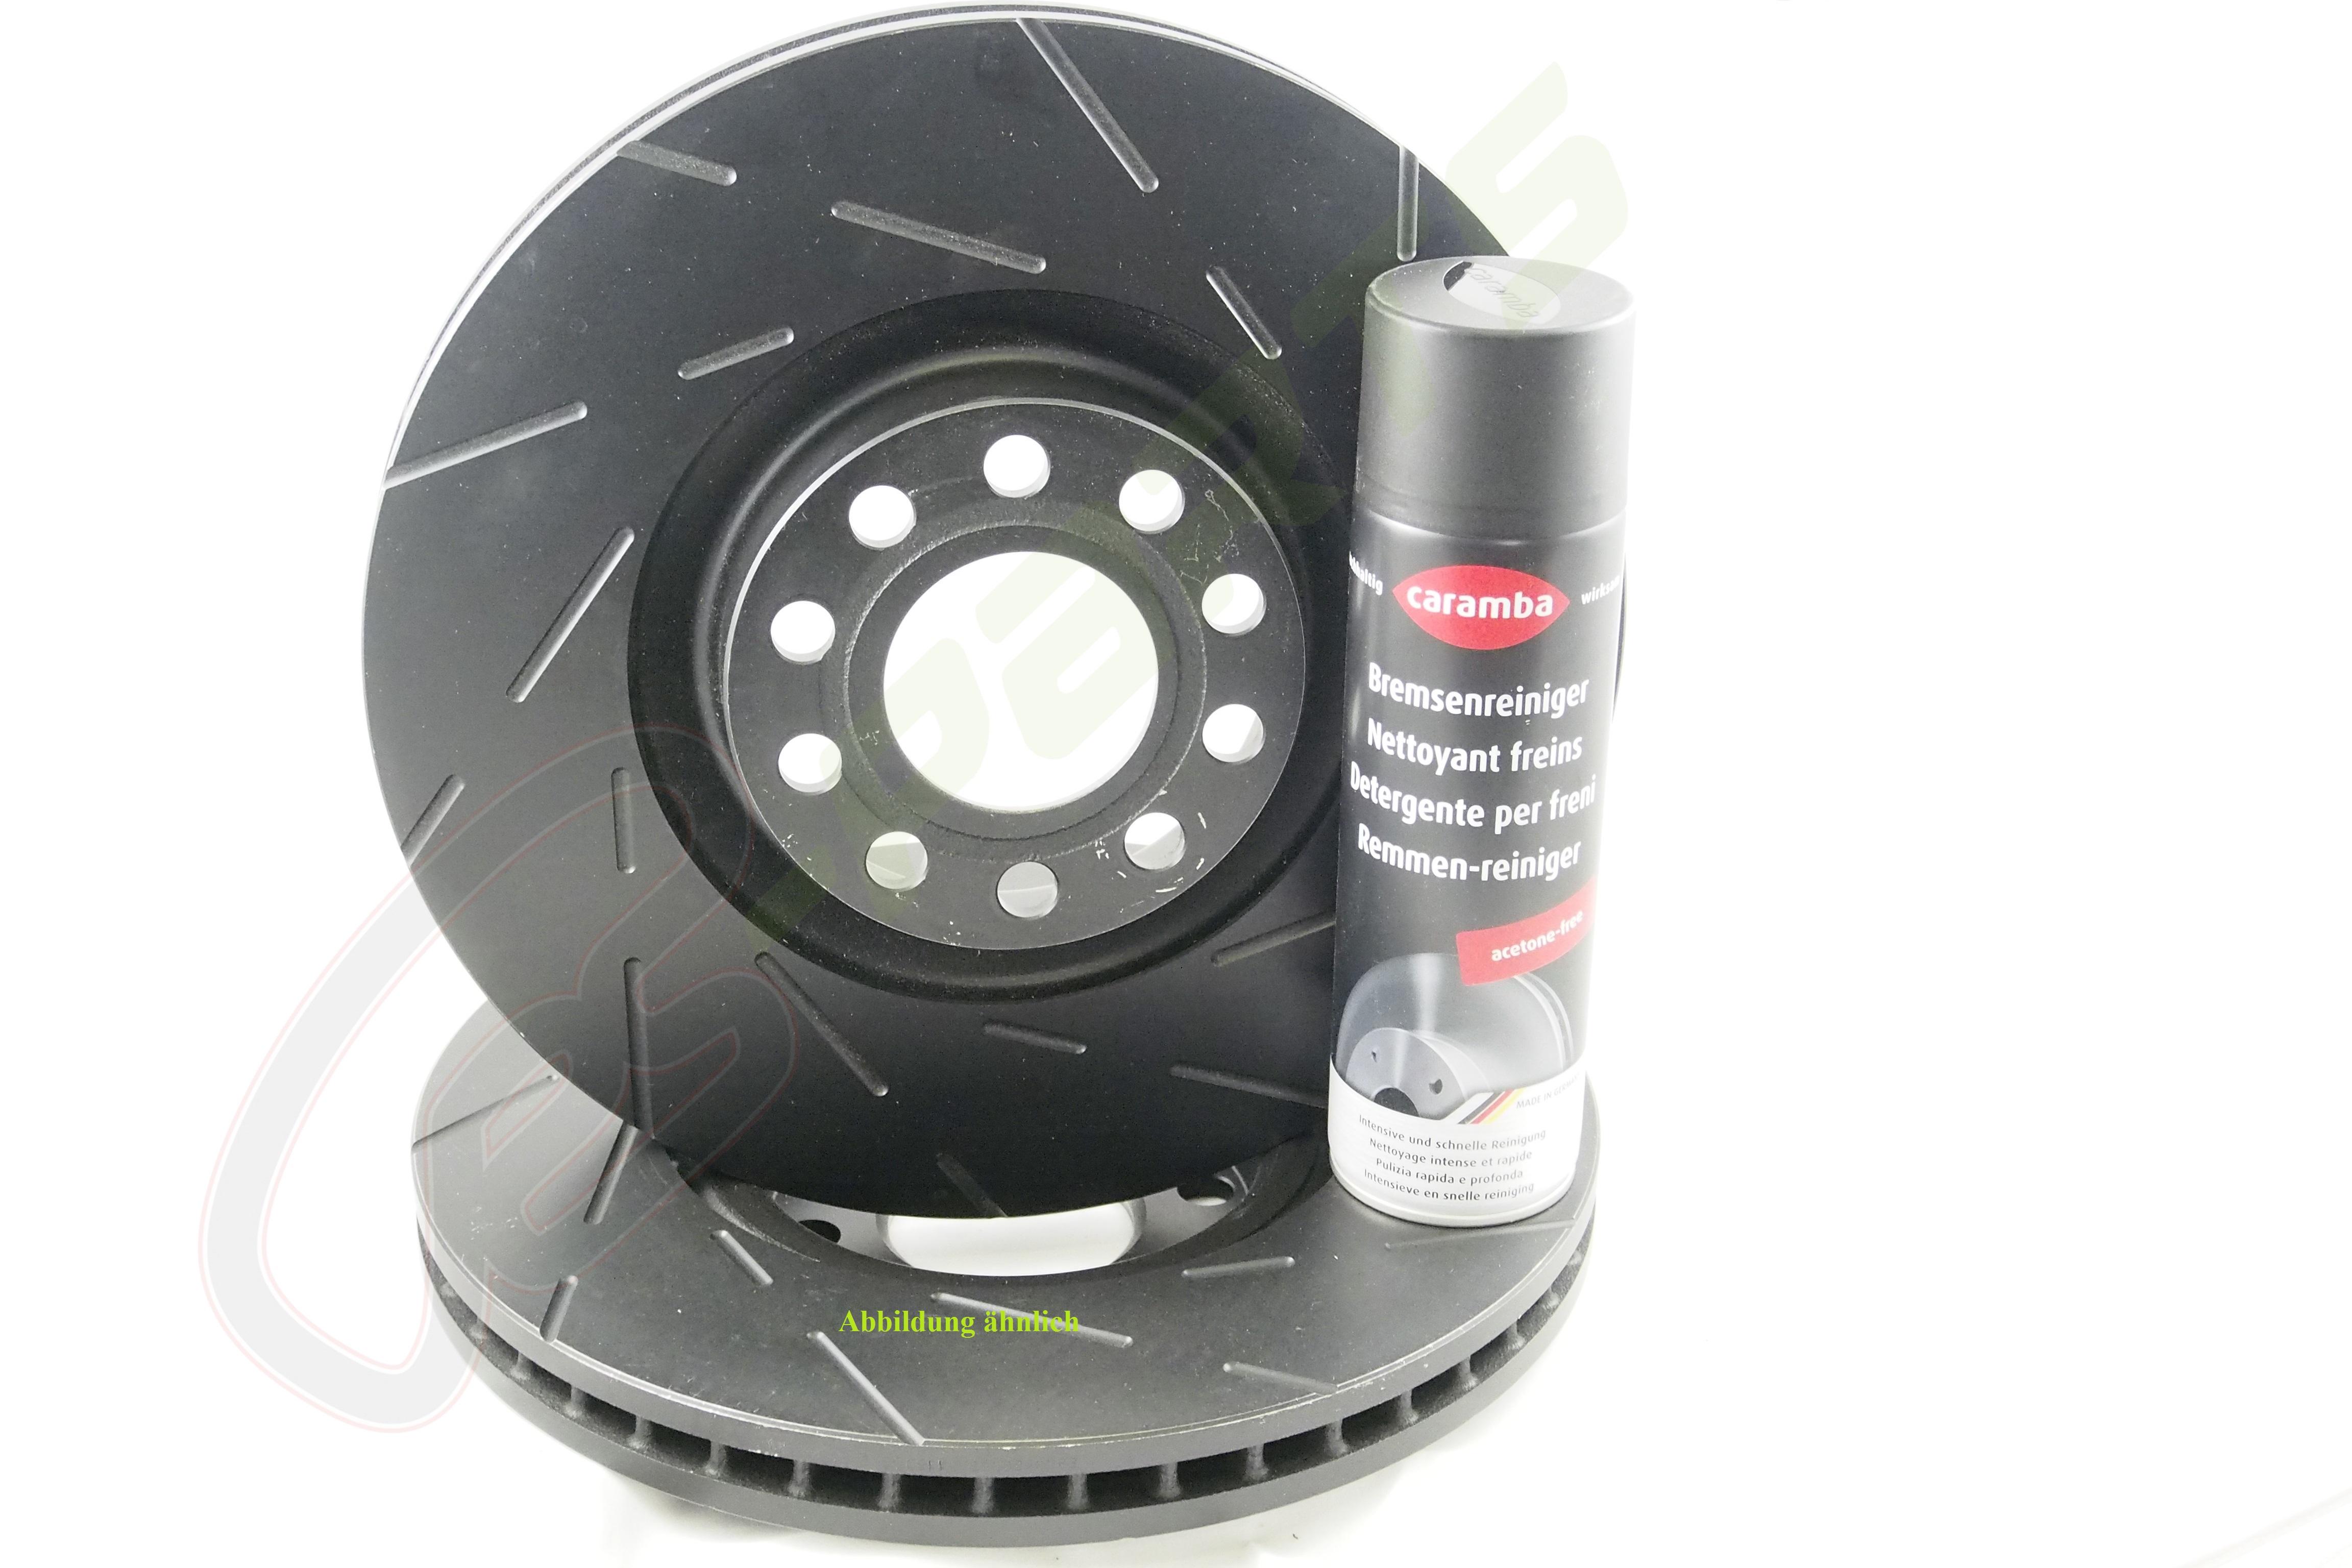 ebc black dash usr931 bremsscheiben 256mm f r hinten skoda. Black Bedroom Furniture Sets. Home Design Ideas